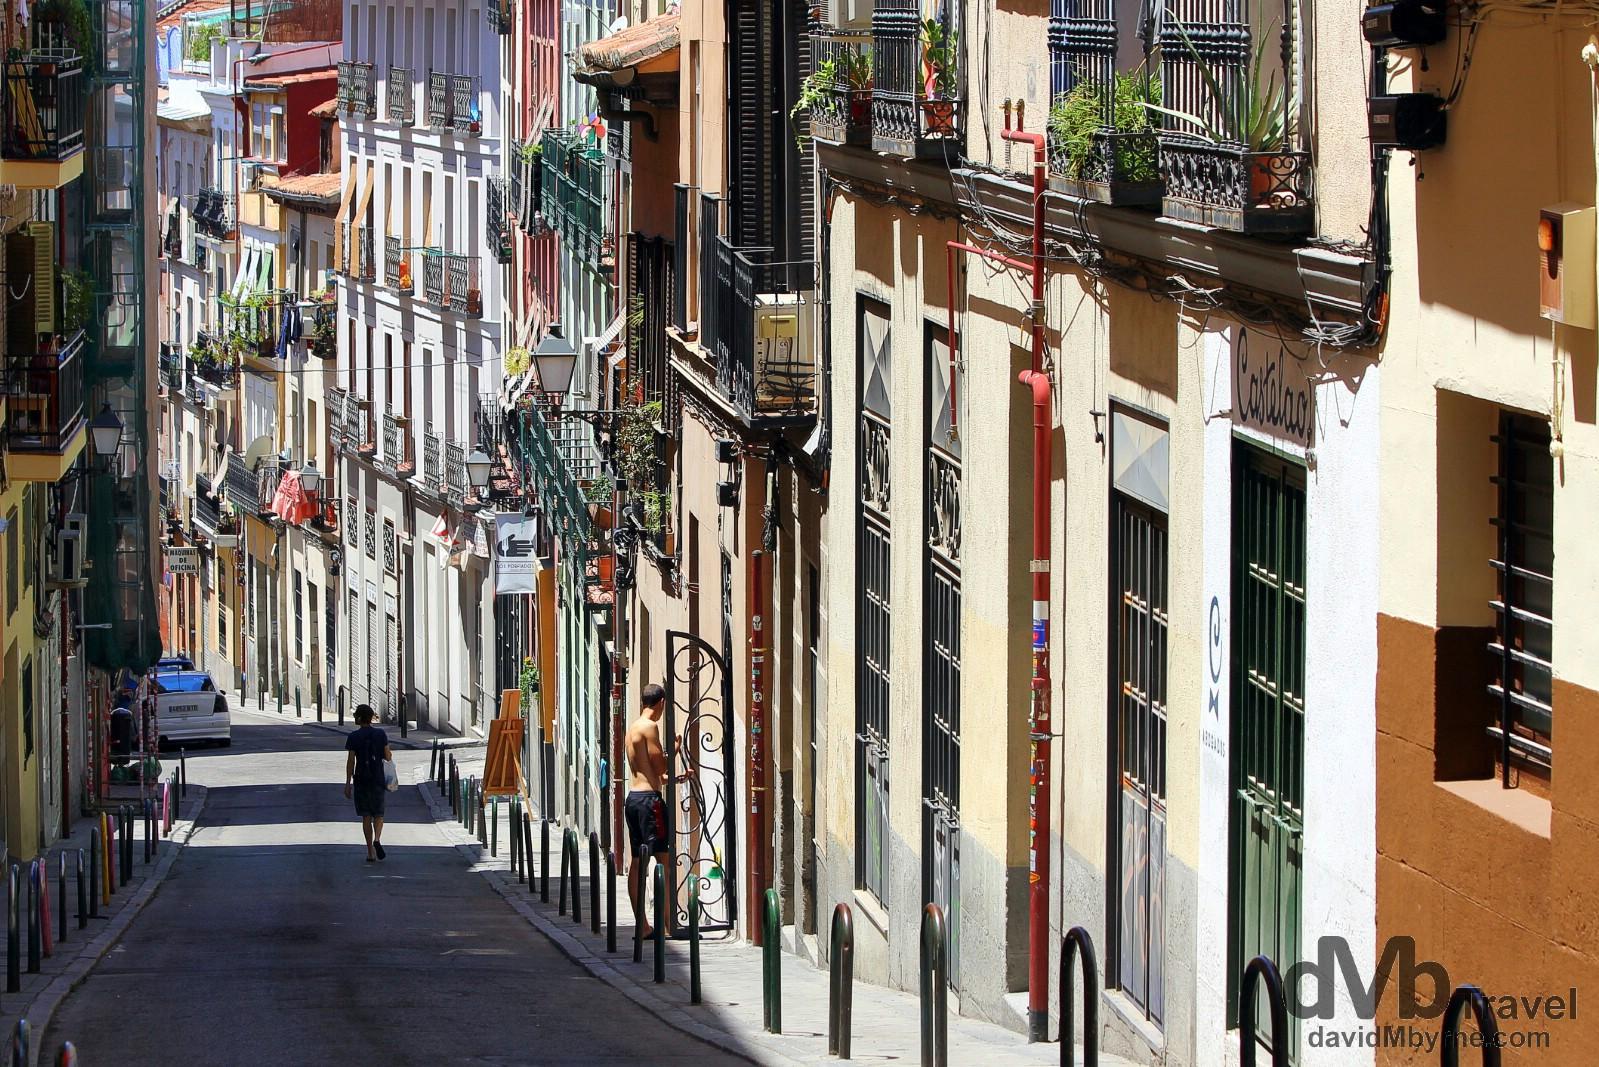 Calle de Buenavista, Madrid, Spain. June 14th, 2014.